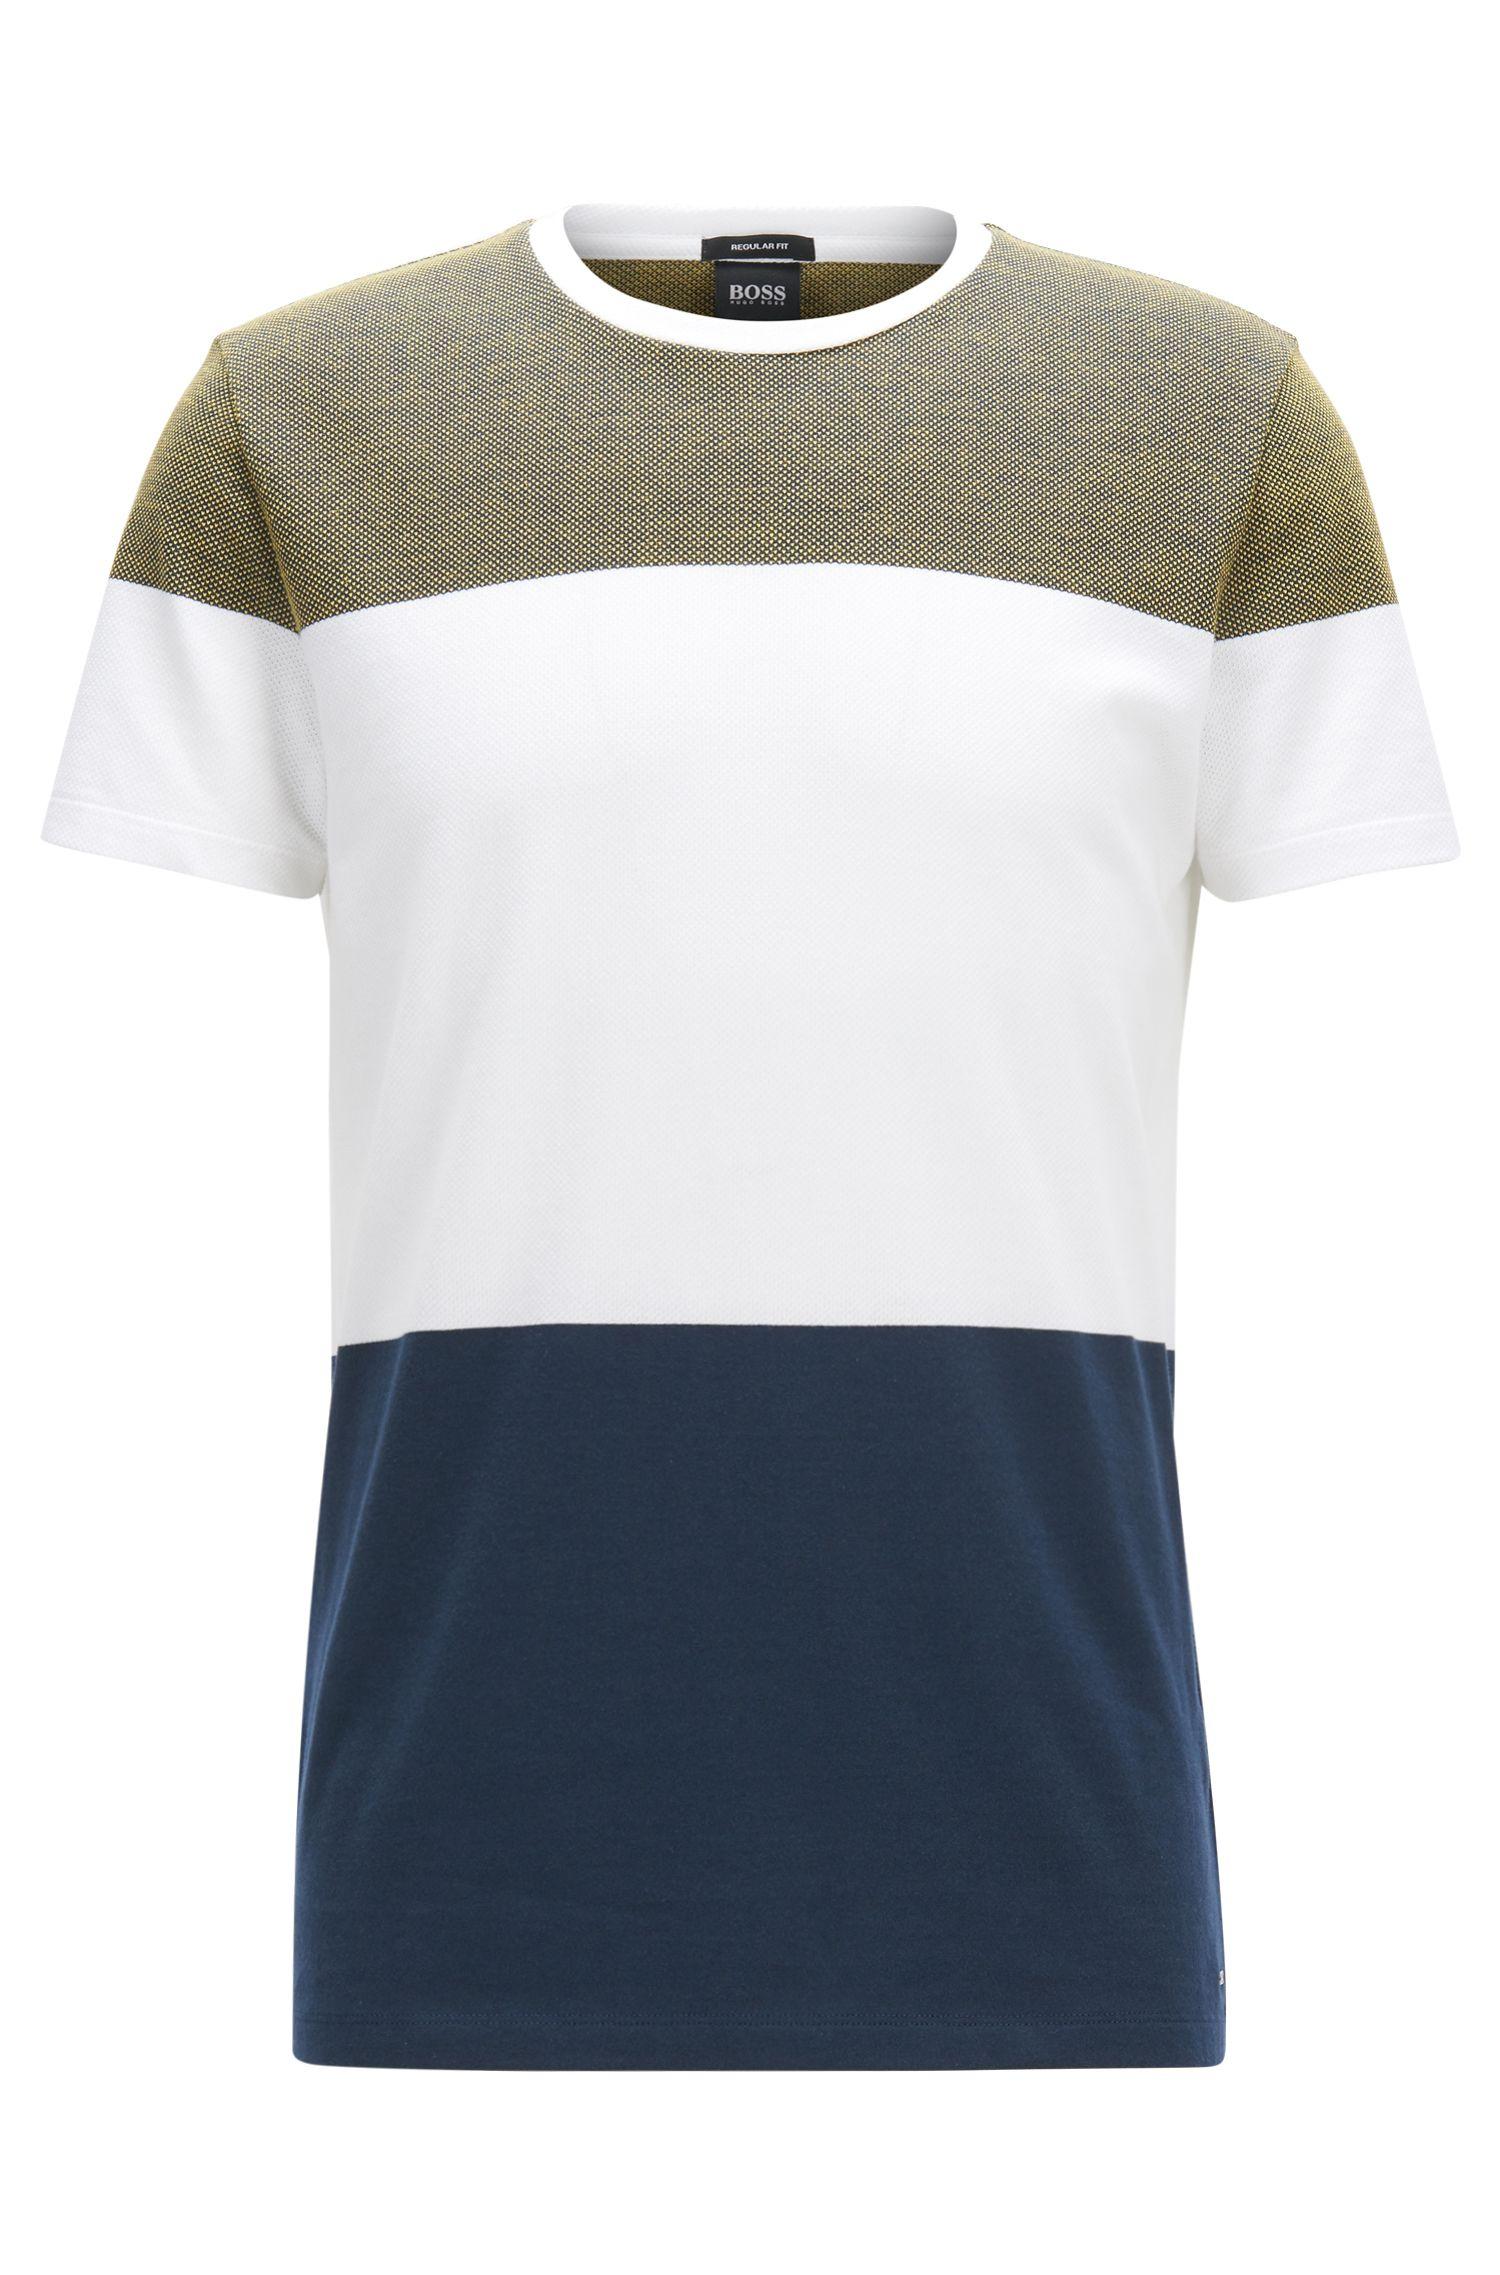 Colorblocked Cotton T-Shirt | Tiburt, Dark Blue